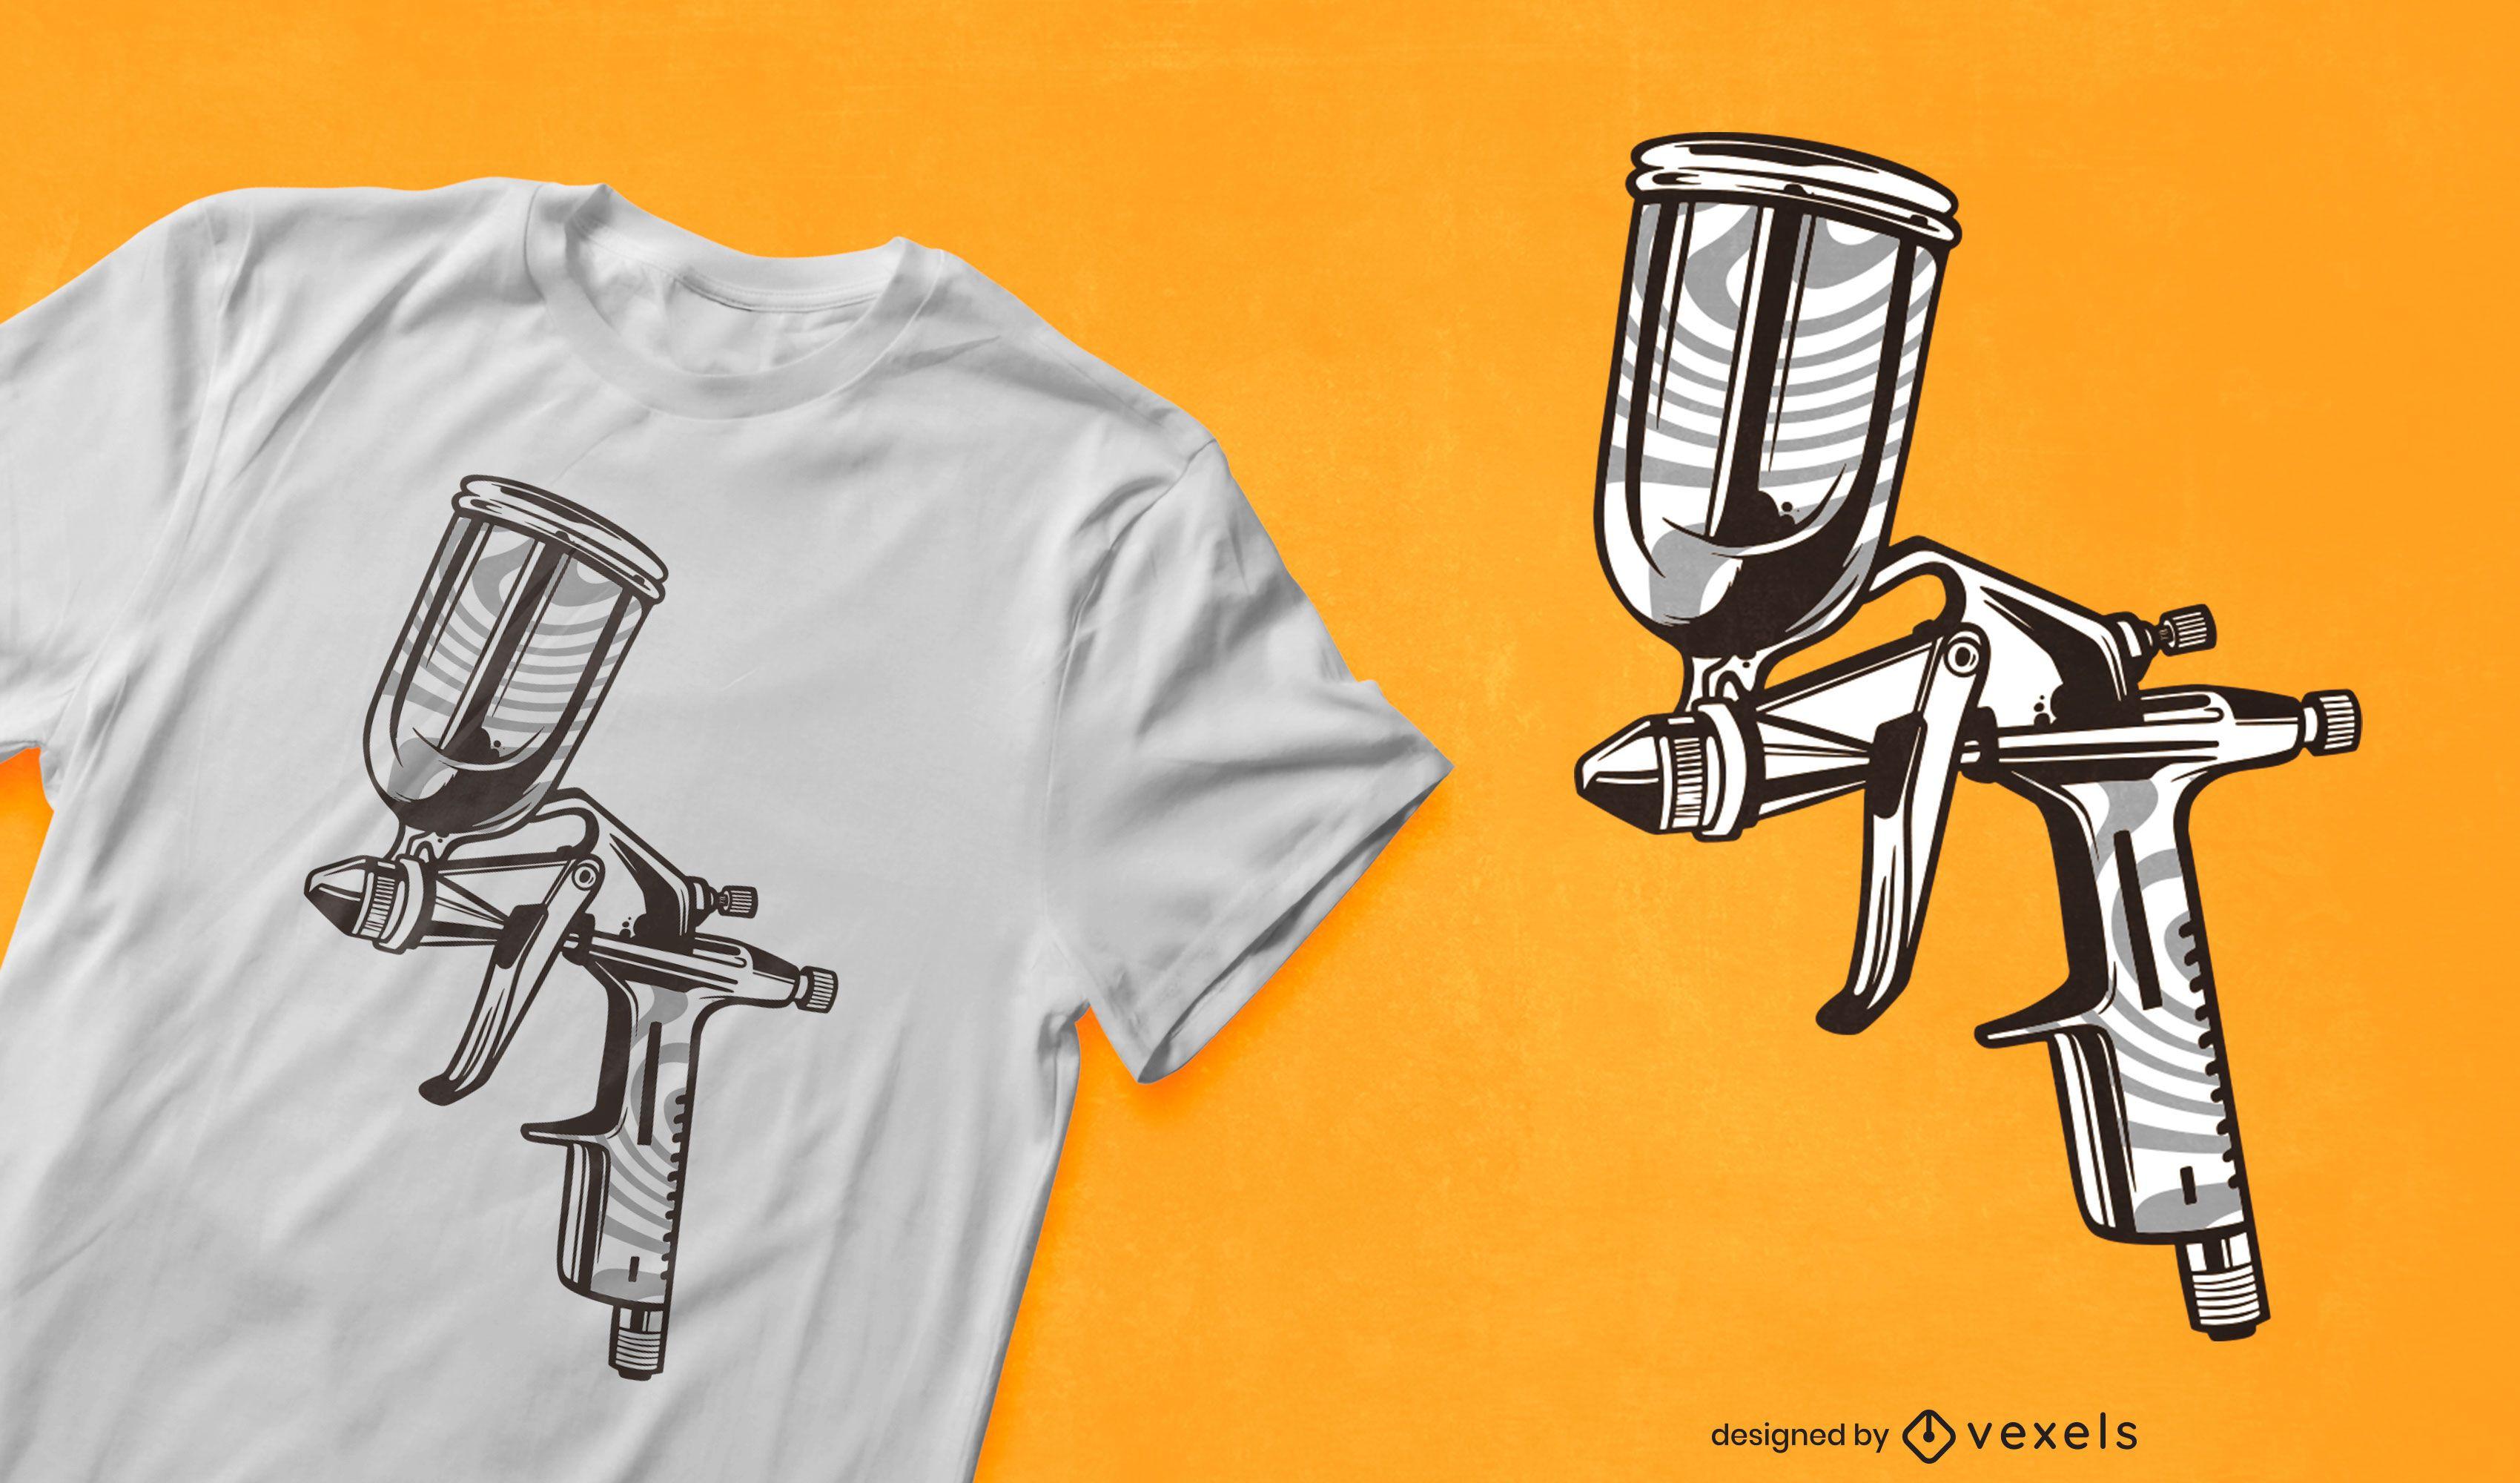 Spray gun t-shirt design